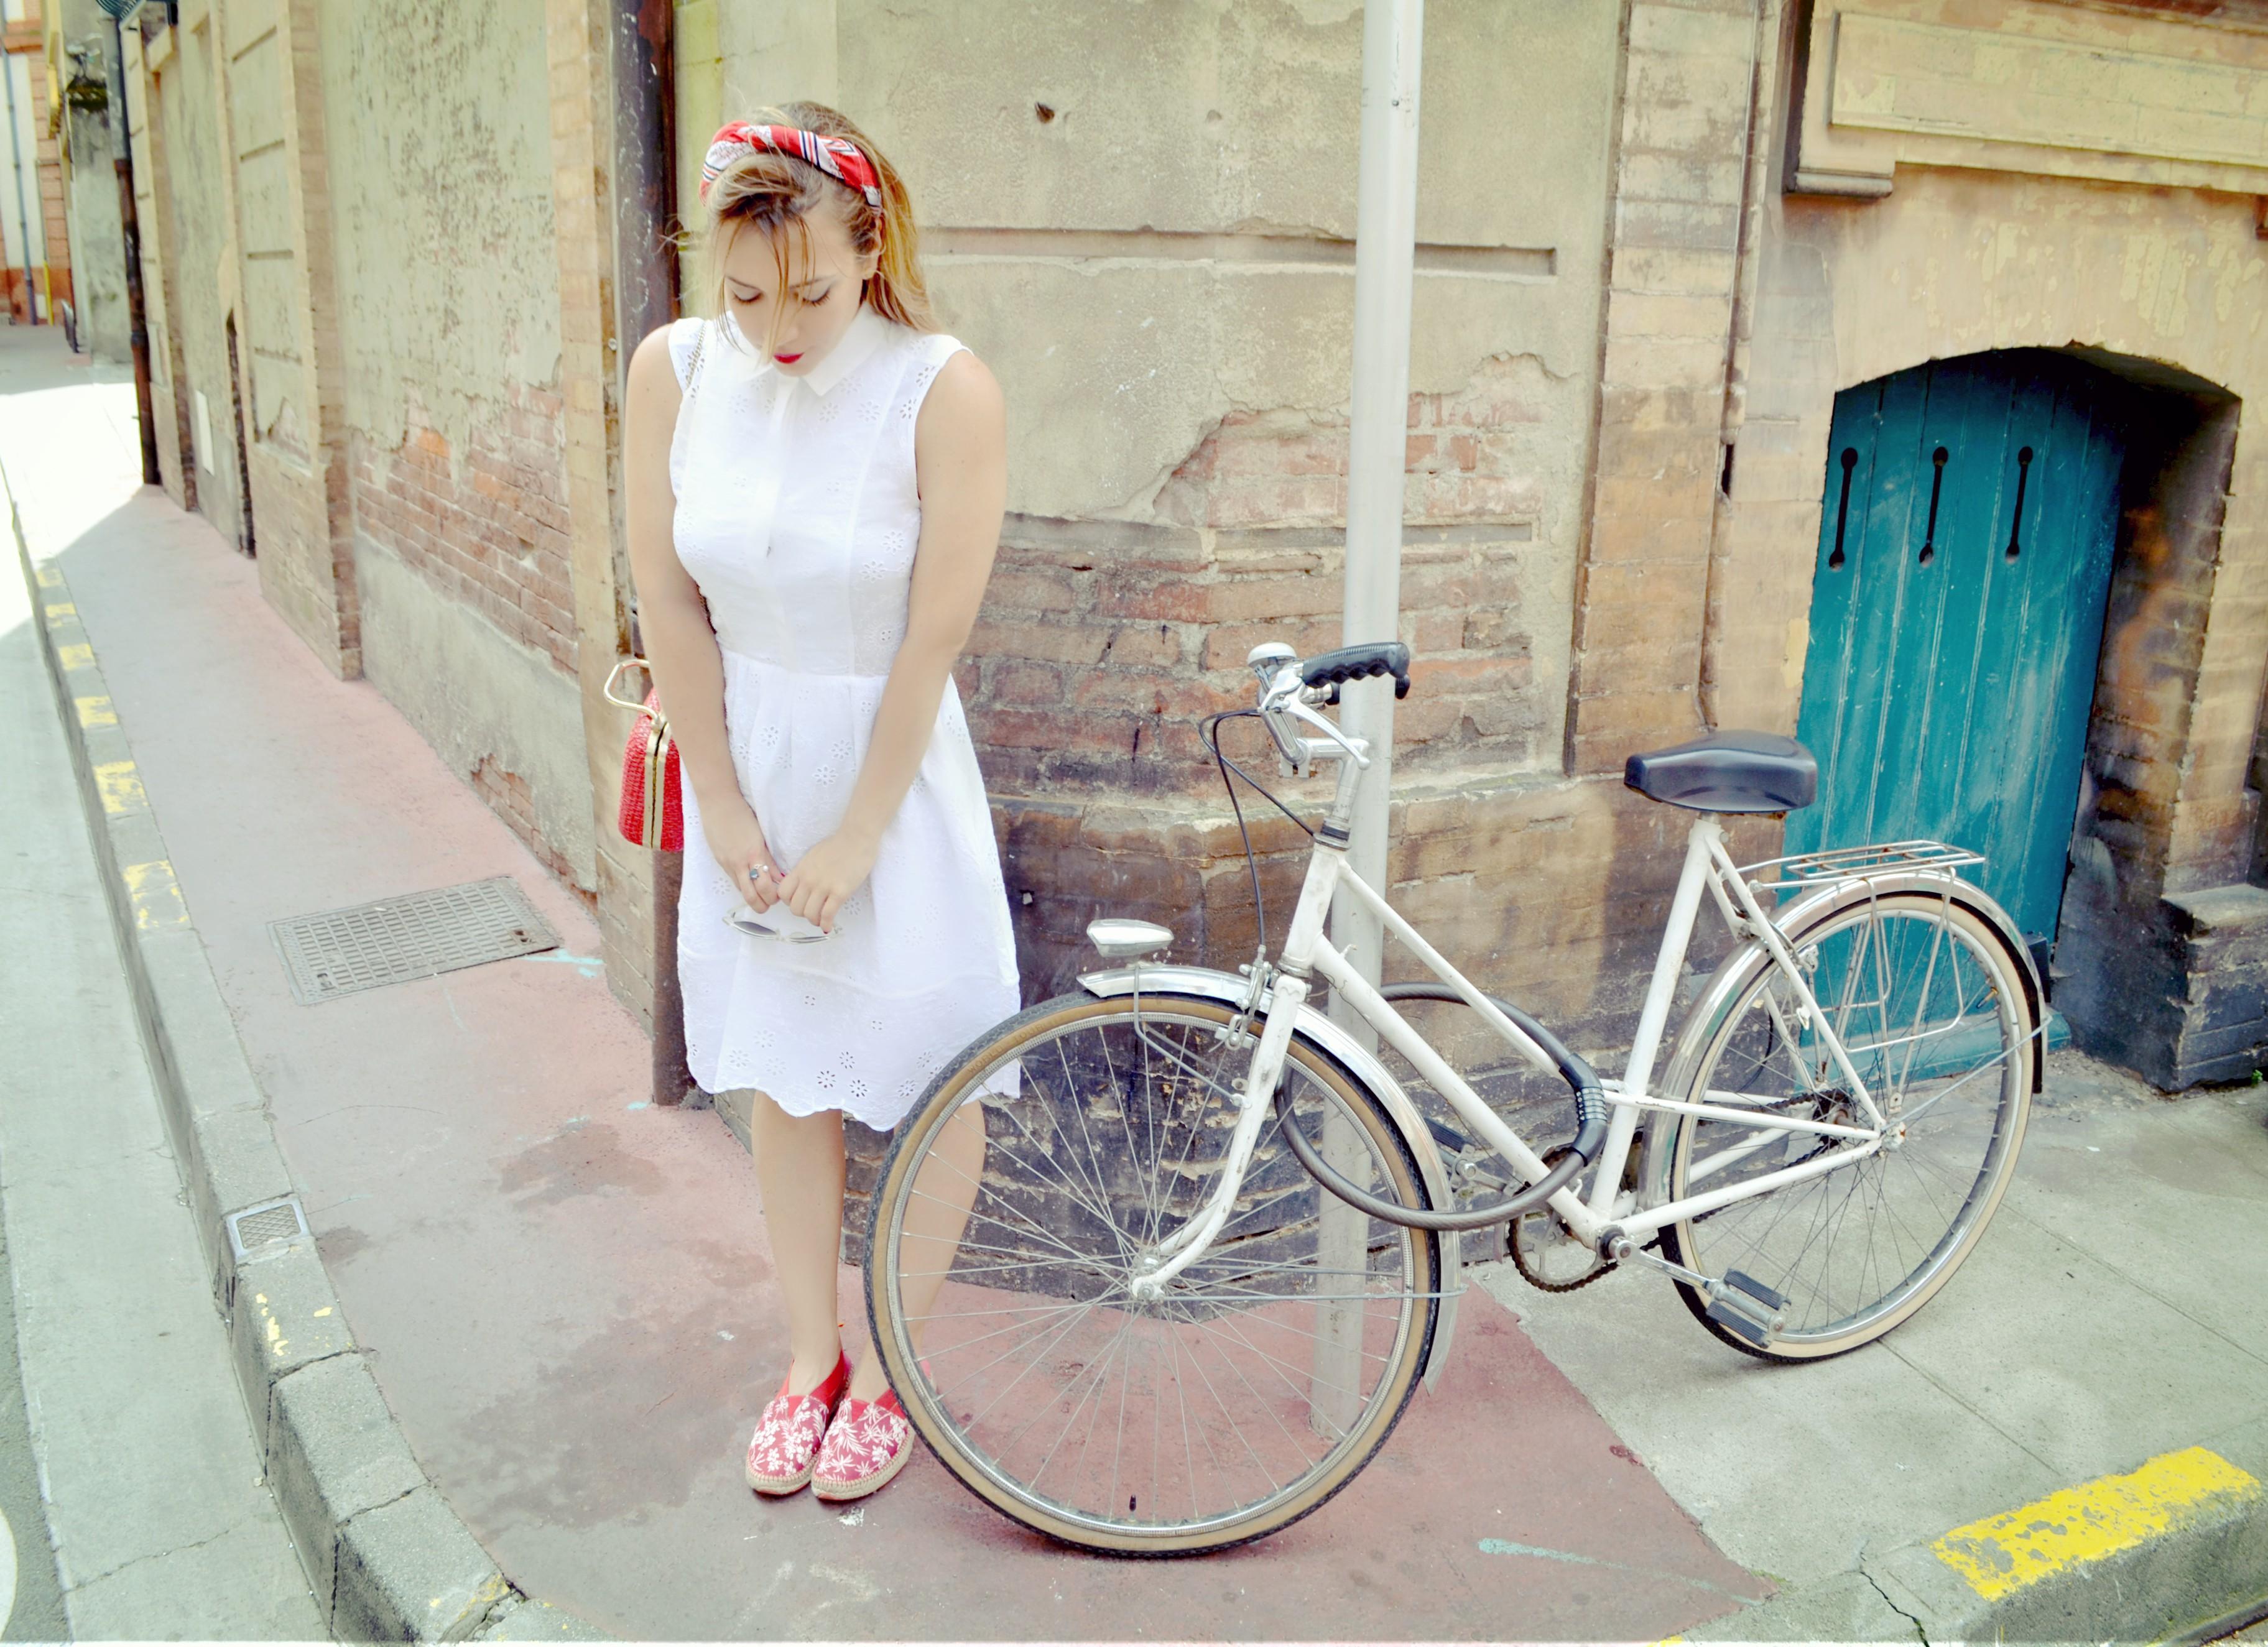 Fashionista-ChicAdicta-influencer-Chic-Adicta-blog-de-moda-fashiontraveller-alpargatas-instint-retro-outfit-vestido-blanco-PiensaenChic-Piensa-en-Chic